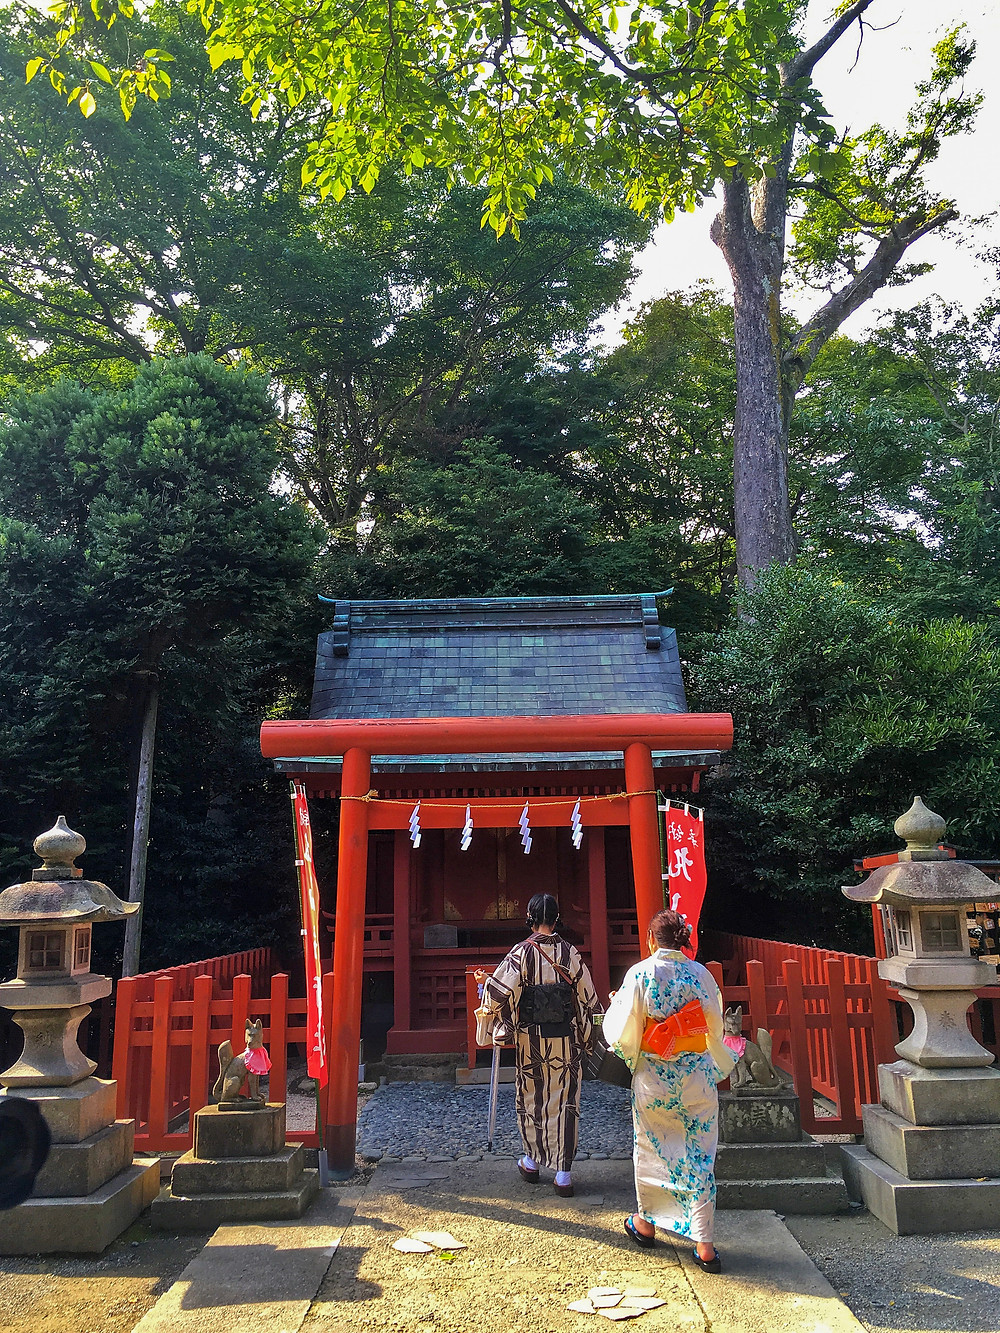 Tsurugaoka Hachimangu in Kamakura Japan